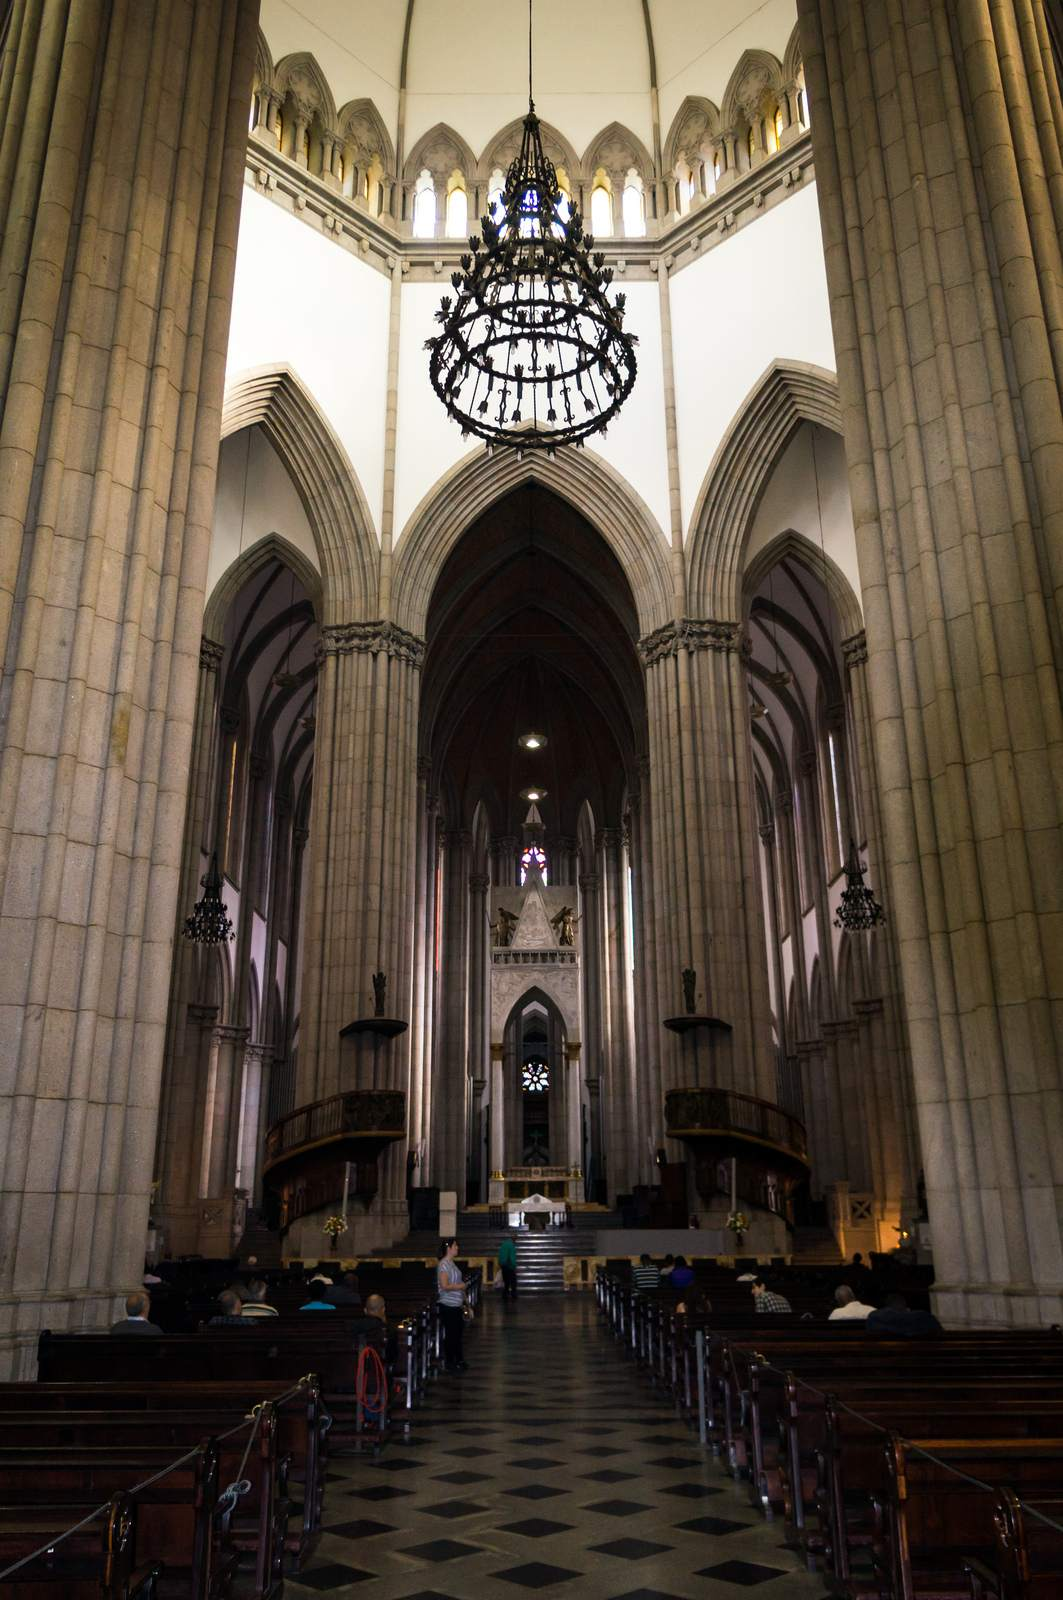 metropolitan cathedral4 Metropolitan Cathedral of Sao Paulo, Brazil